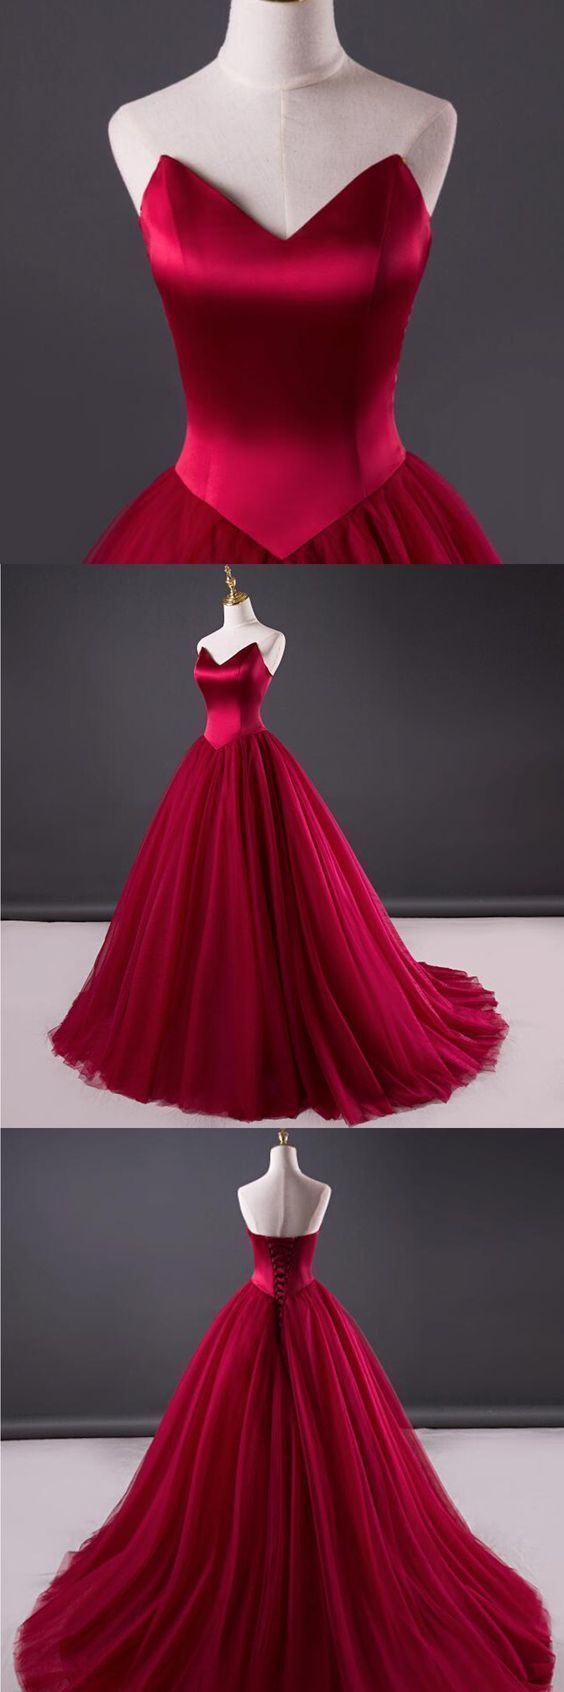 Prom Dresses Wine Red Prom Dress New Prom Prom Dresses Fashion Sky Weddings Vestidos De Fiesta Vestido De Baile Vestidos De Baile Largos